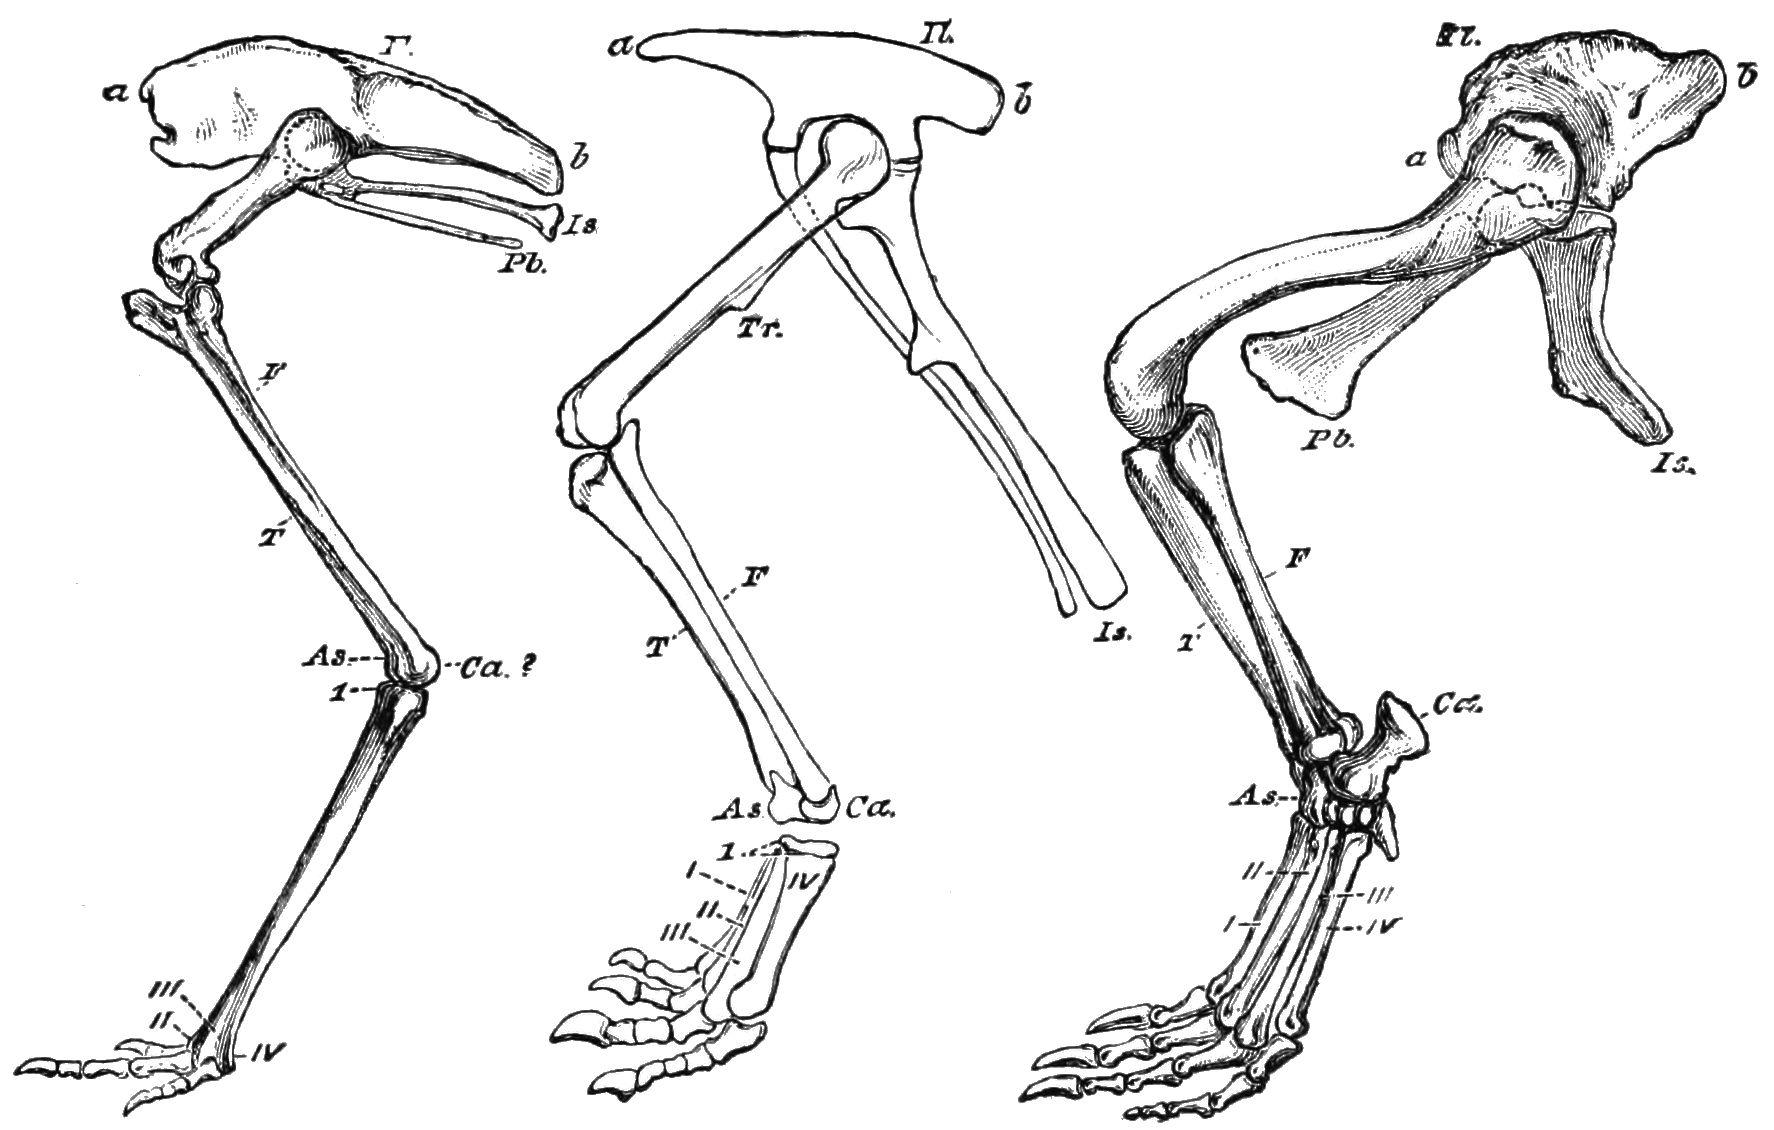 dinosaur leg bone - Google 検索 | HUMAN | Pinterest | Animal anatomy ...